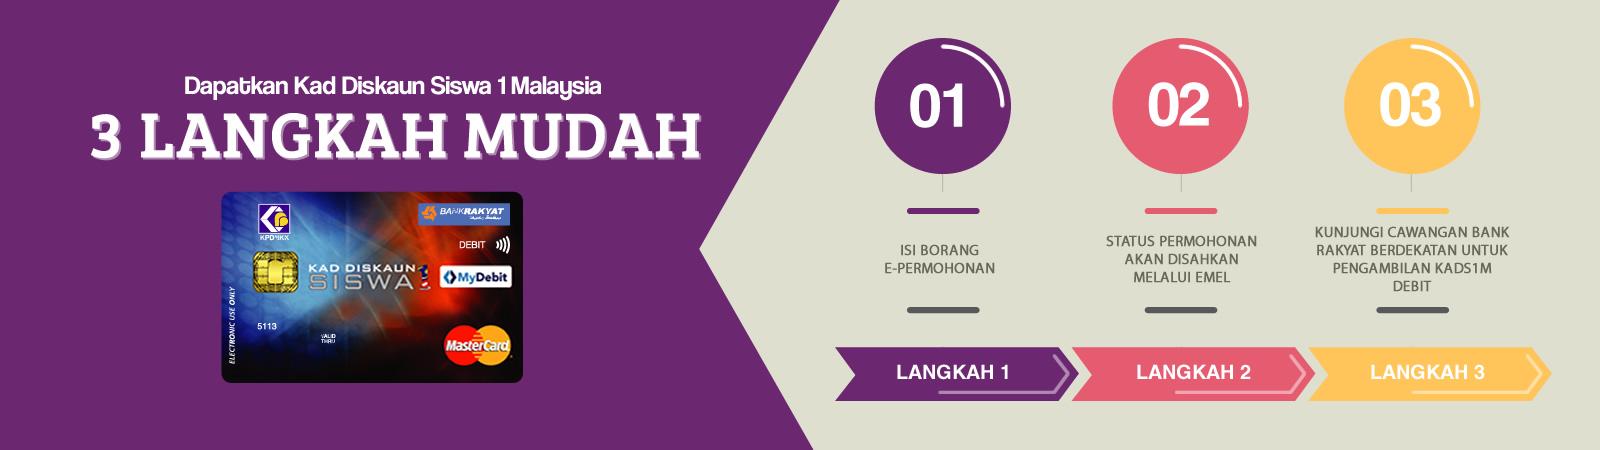 KADS1M, kad siswa pelajar 1 malaysia, kad siswa, baucar buku 2017, bank rakyat,